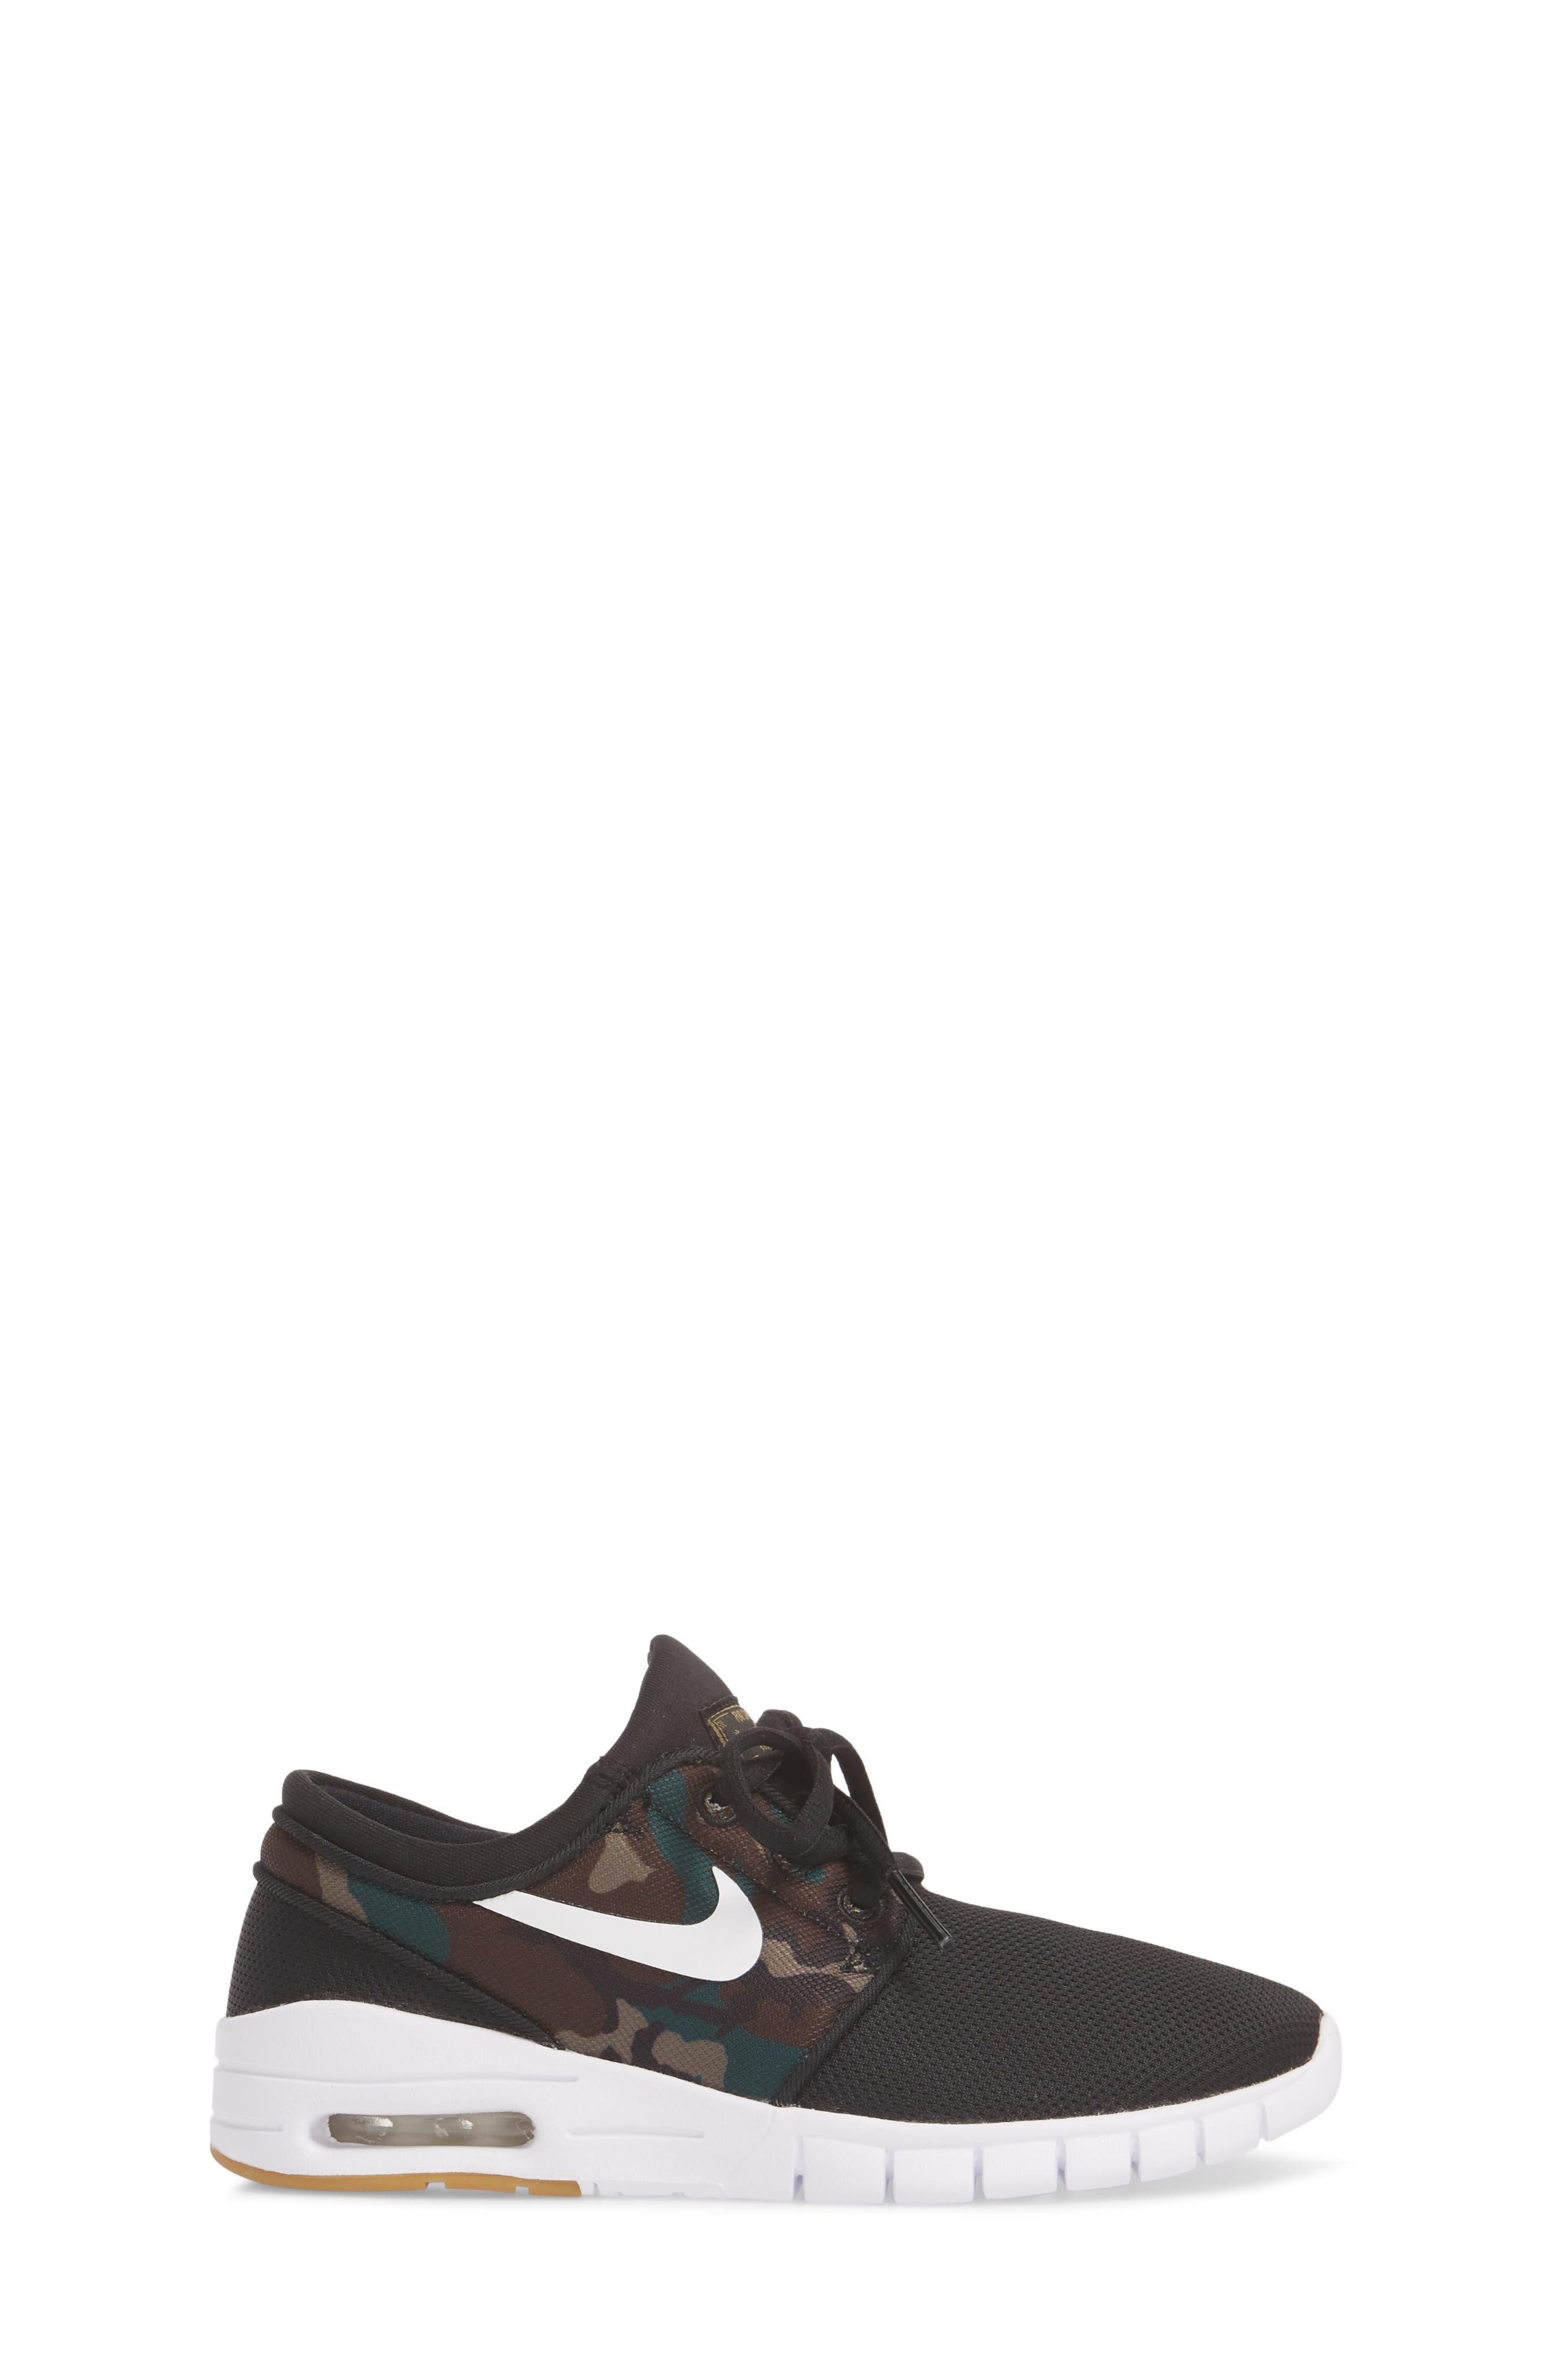 Stefan Janoski Max SB Skate Sneaker,                             Alternate thumbnail 3, color,                             006